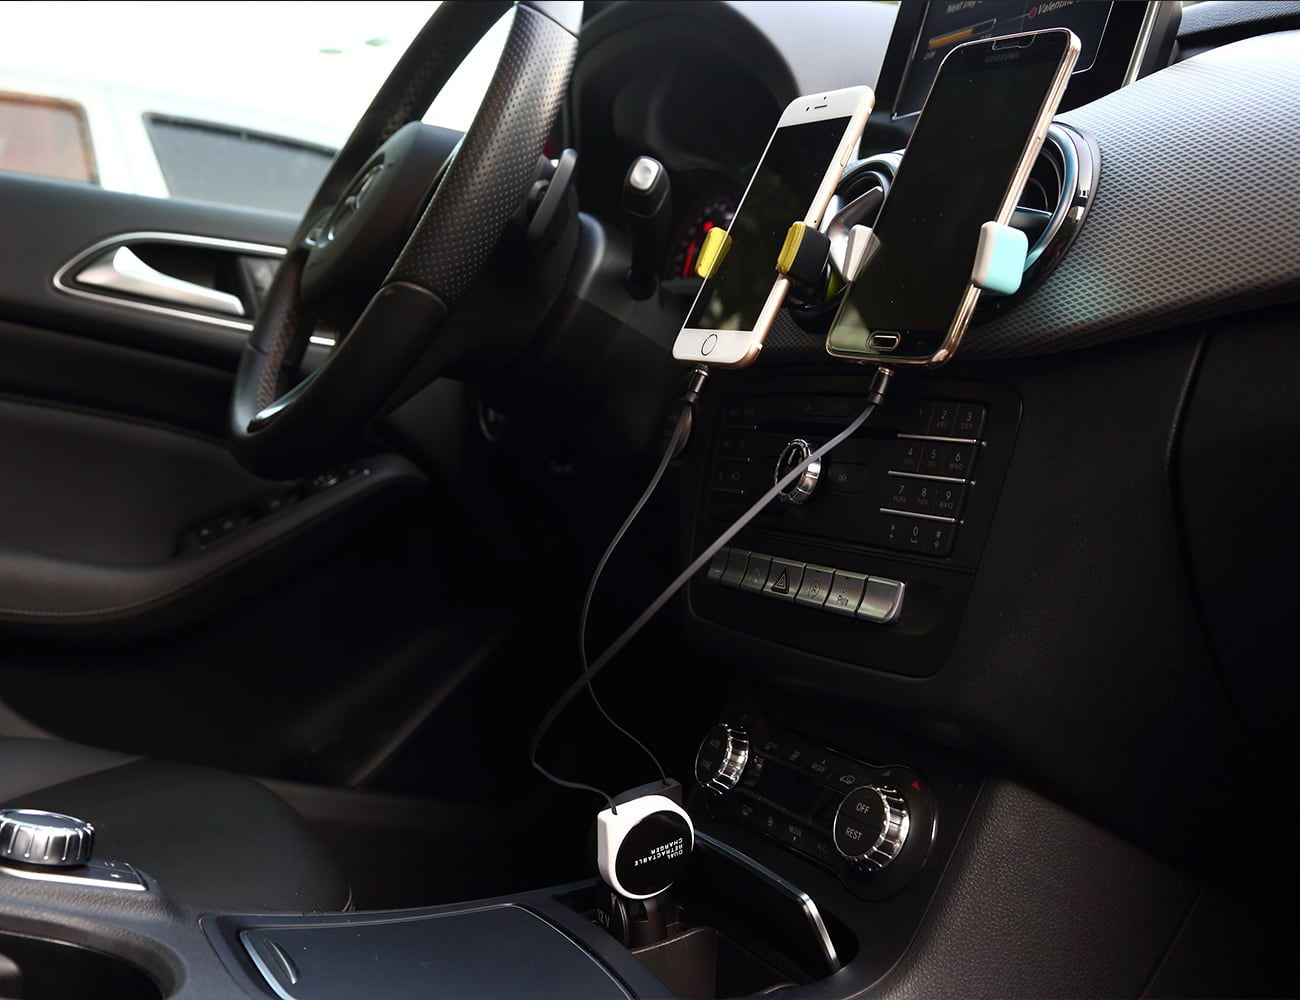 Bency Sense Universal Smartphone Car Charger